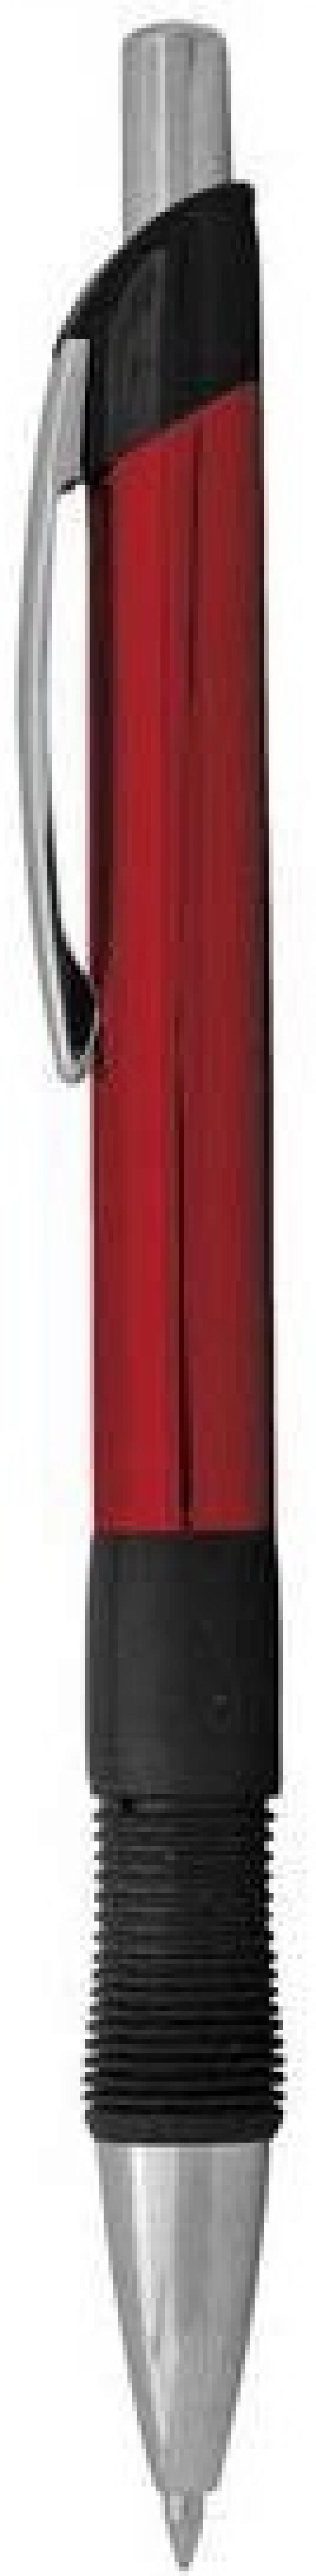 Шариковая ручка автоматическая Index IMWT1132/RD/бшк синий 0.5 мм IMWT1132/RD/бшк цена